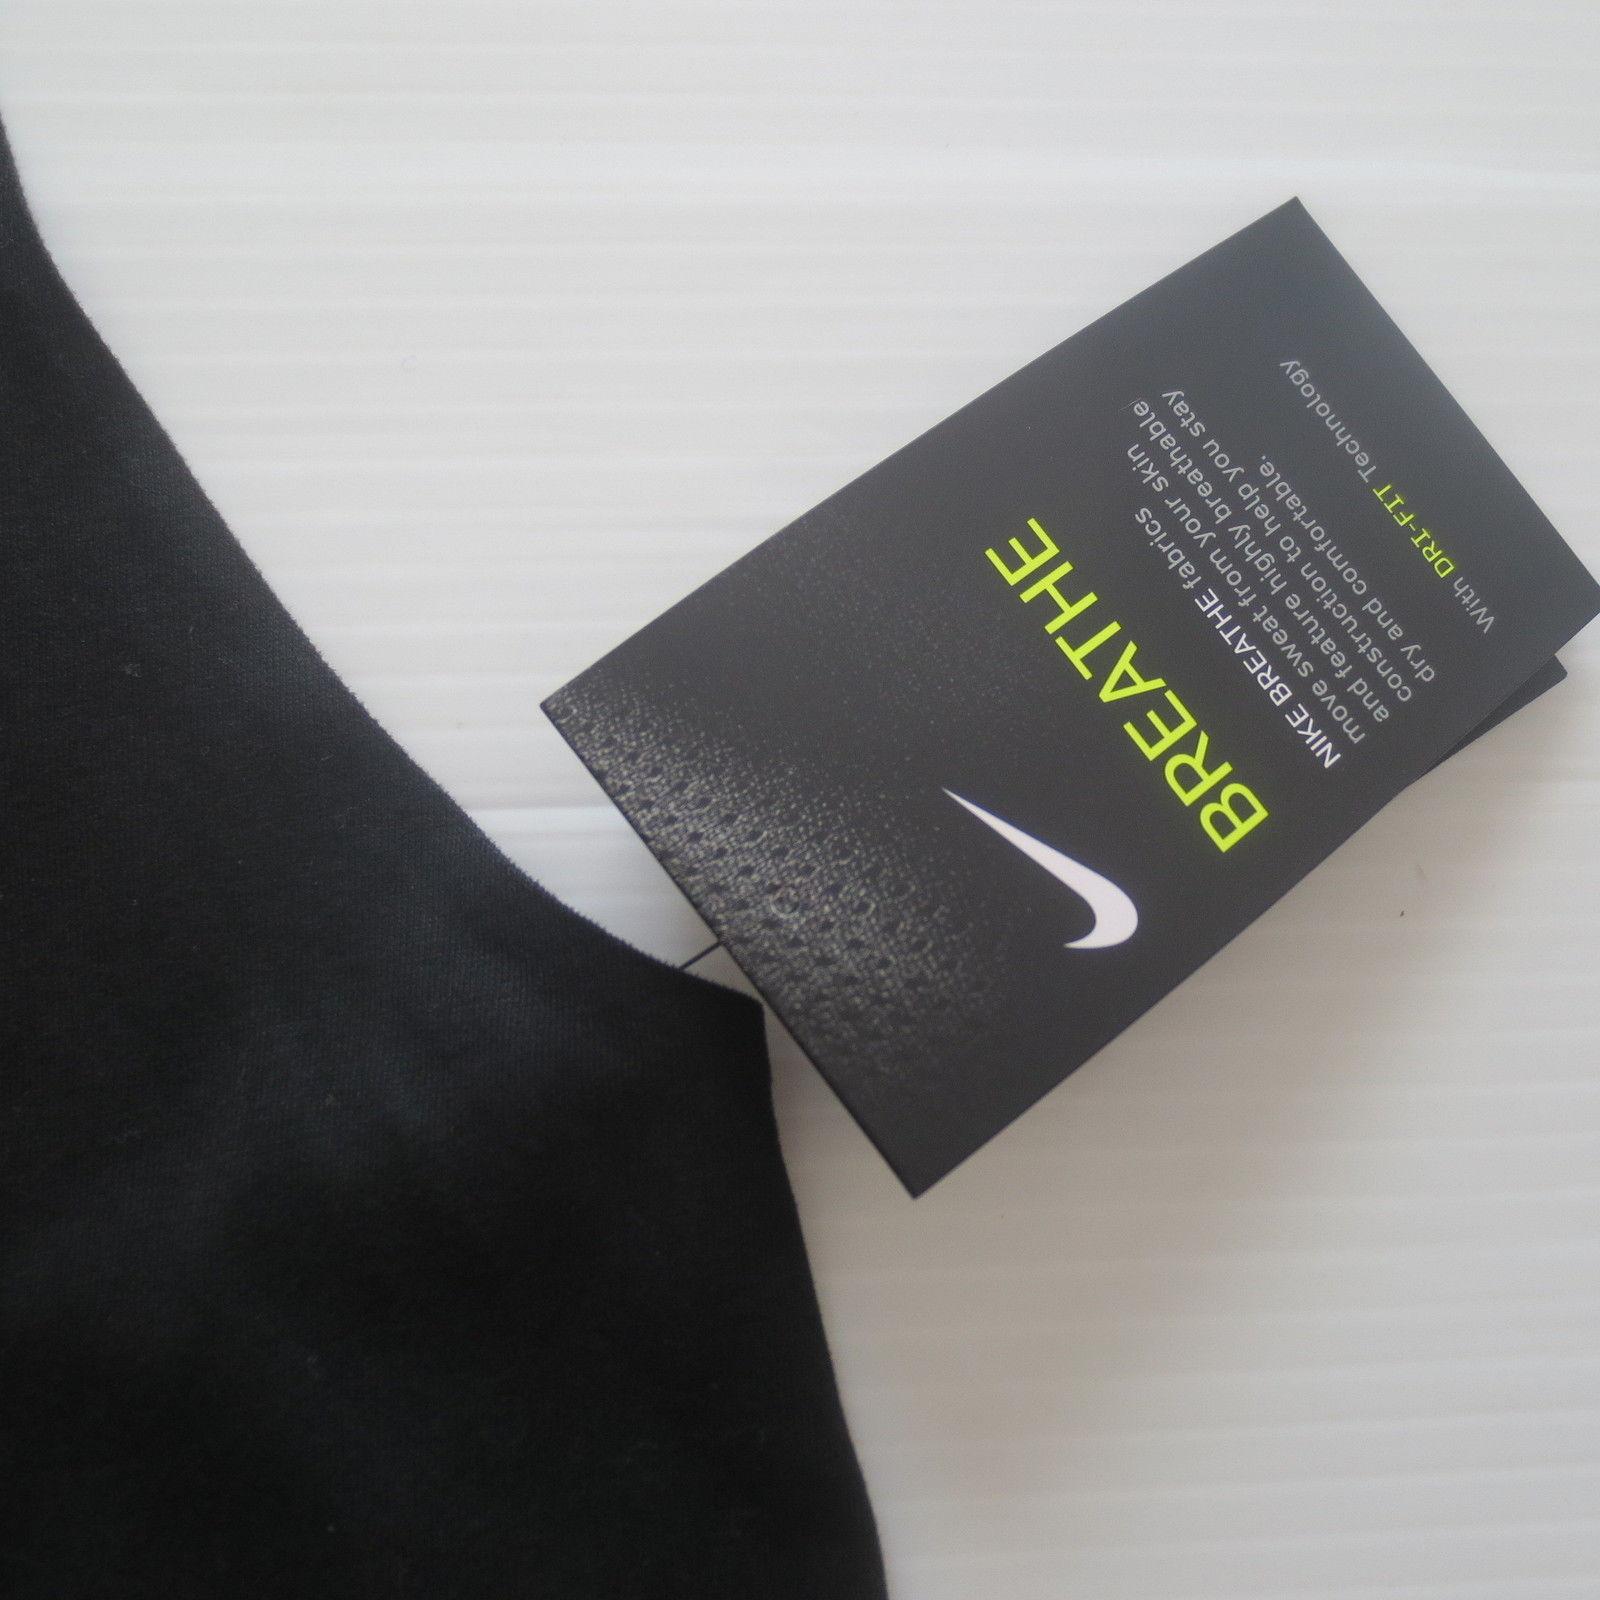 Nike Women Breathe Tank Top Shirt - 862774 - Black 010 - Size L - NWT image 5